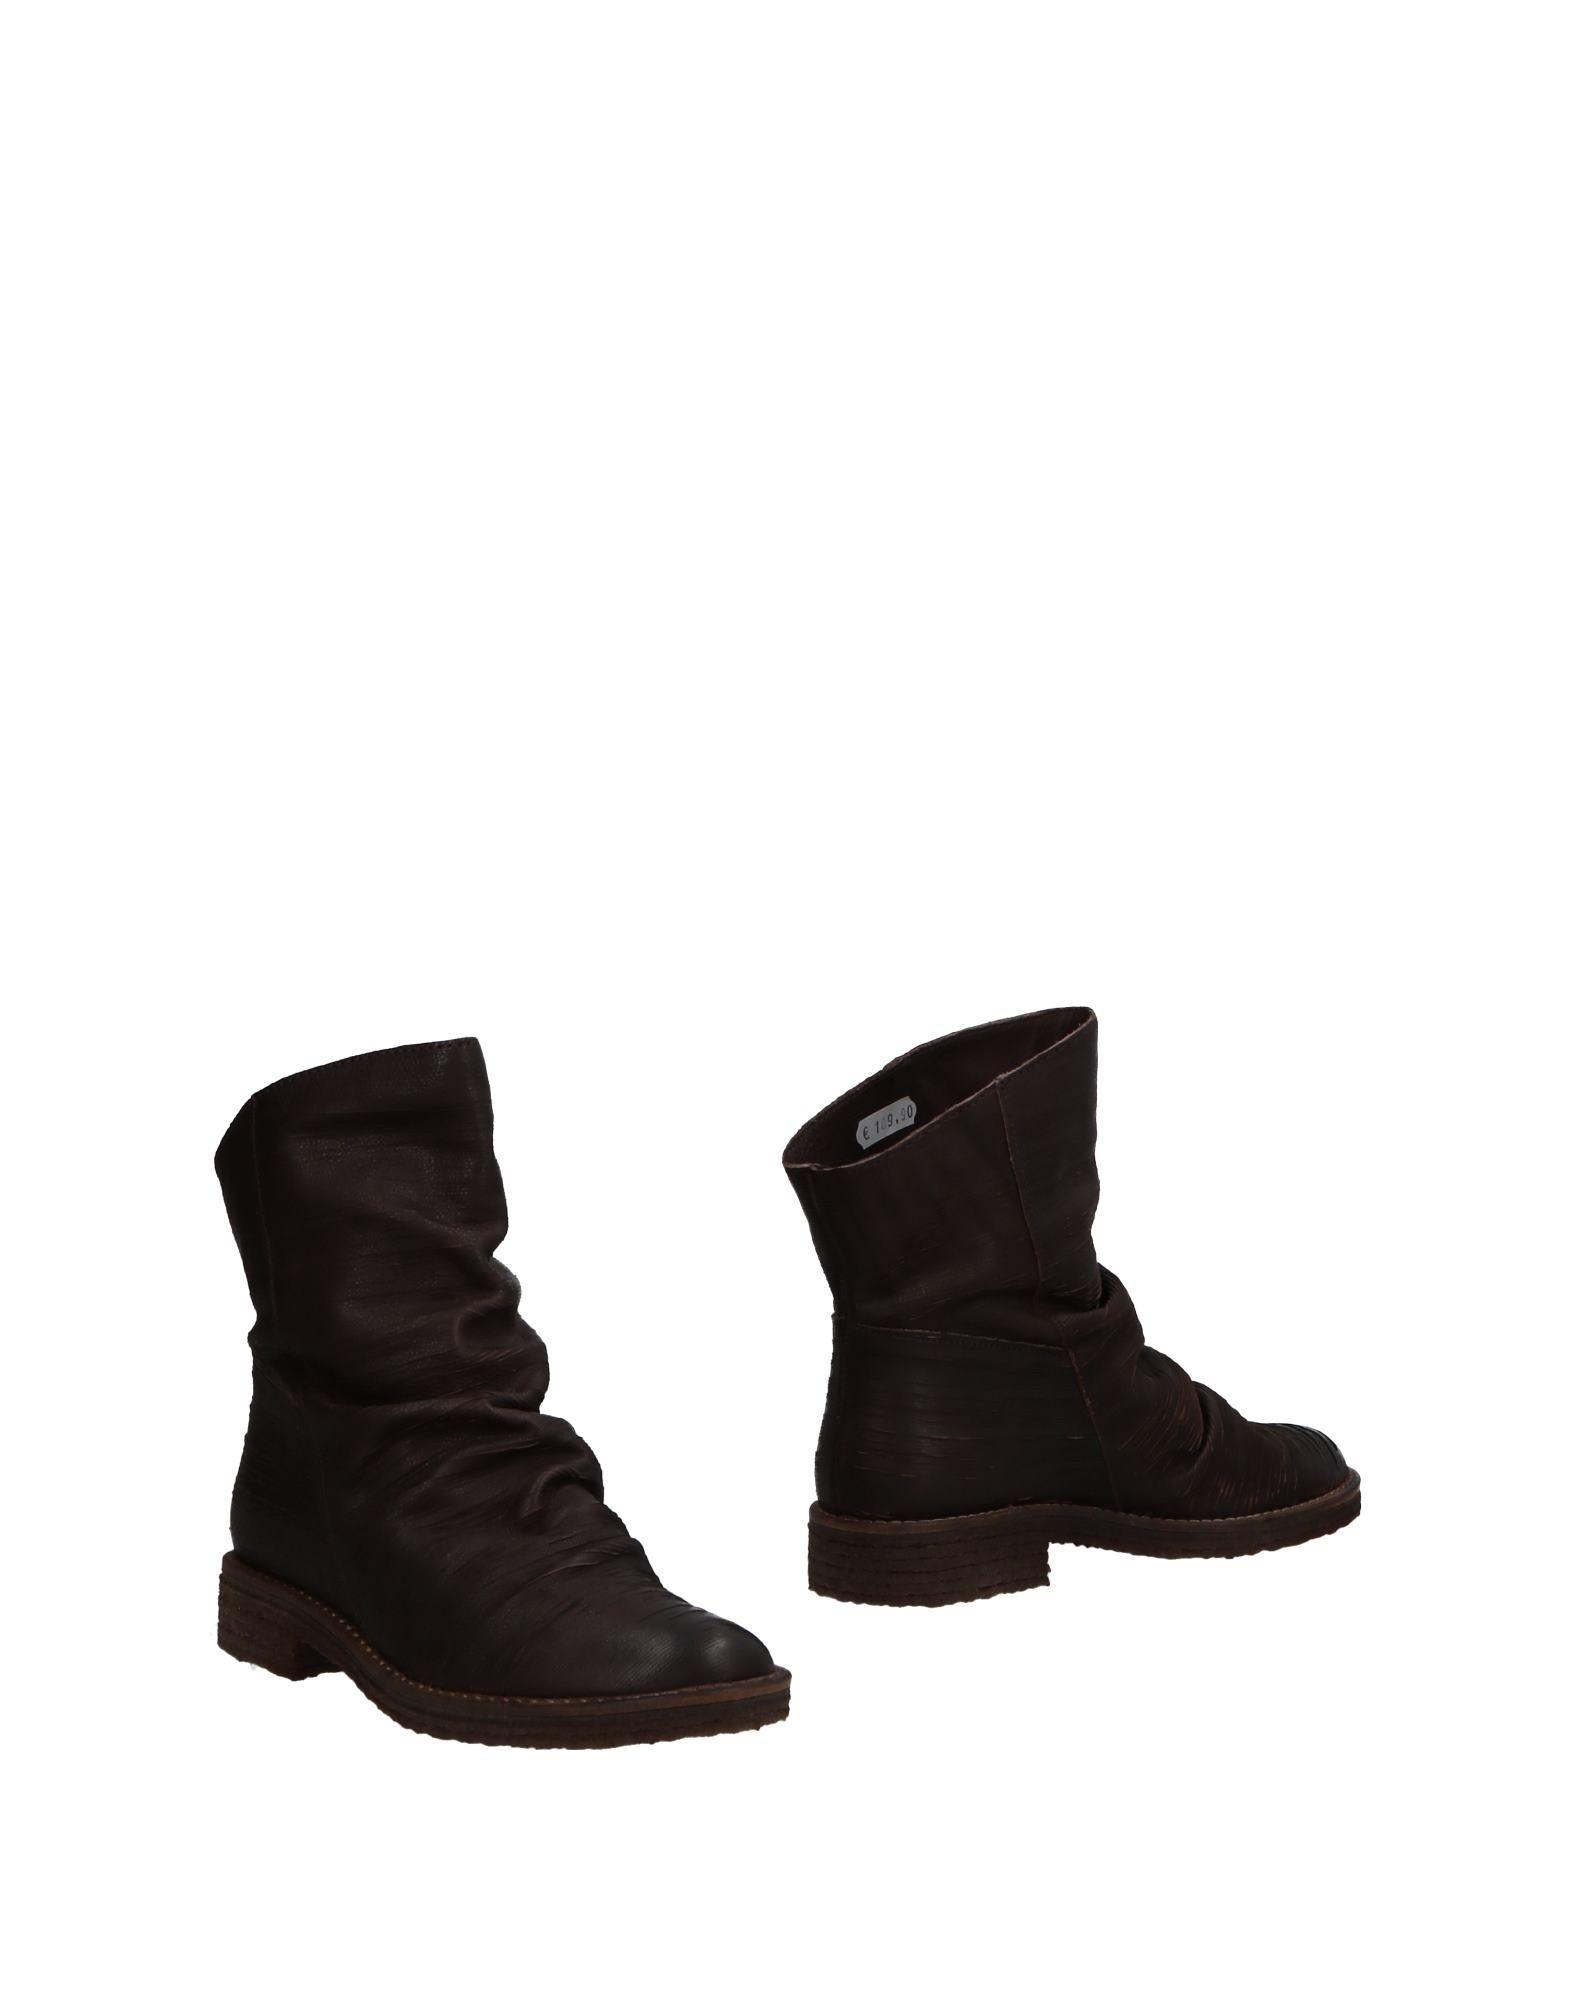 Felmini Ankle Boot Boots - Women Felmini Ankle Boots Boot online on  Canada - 11492126SR ca8202